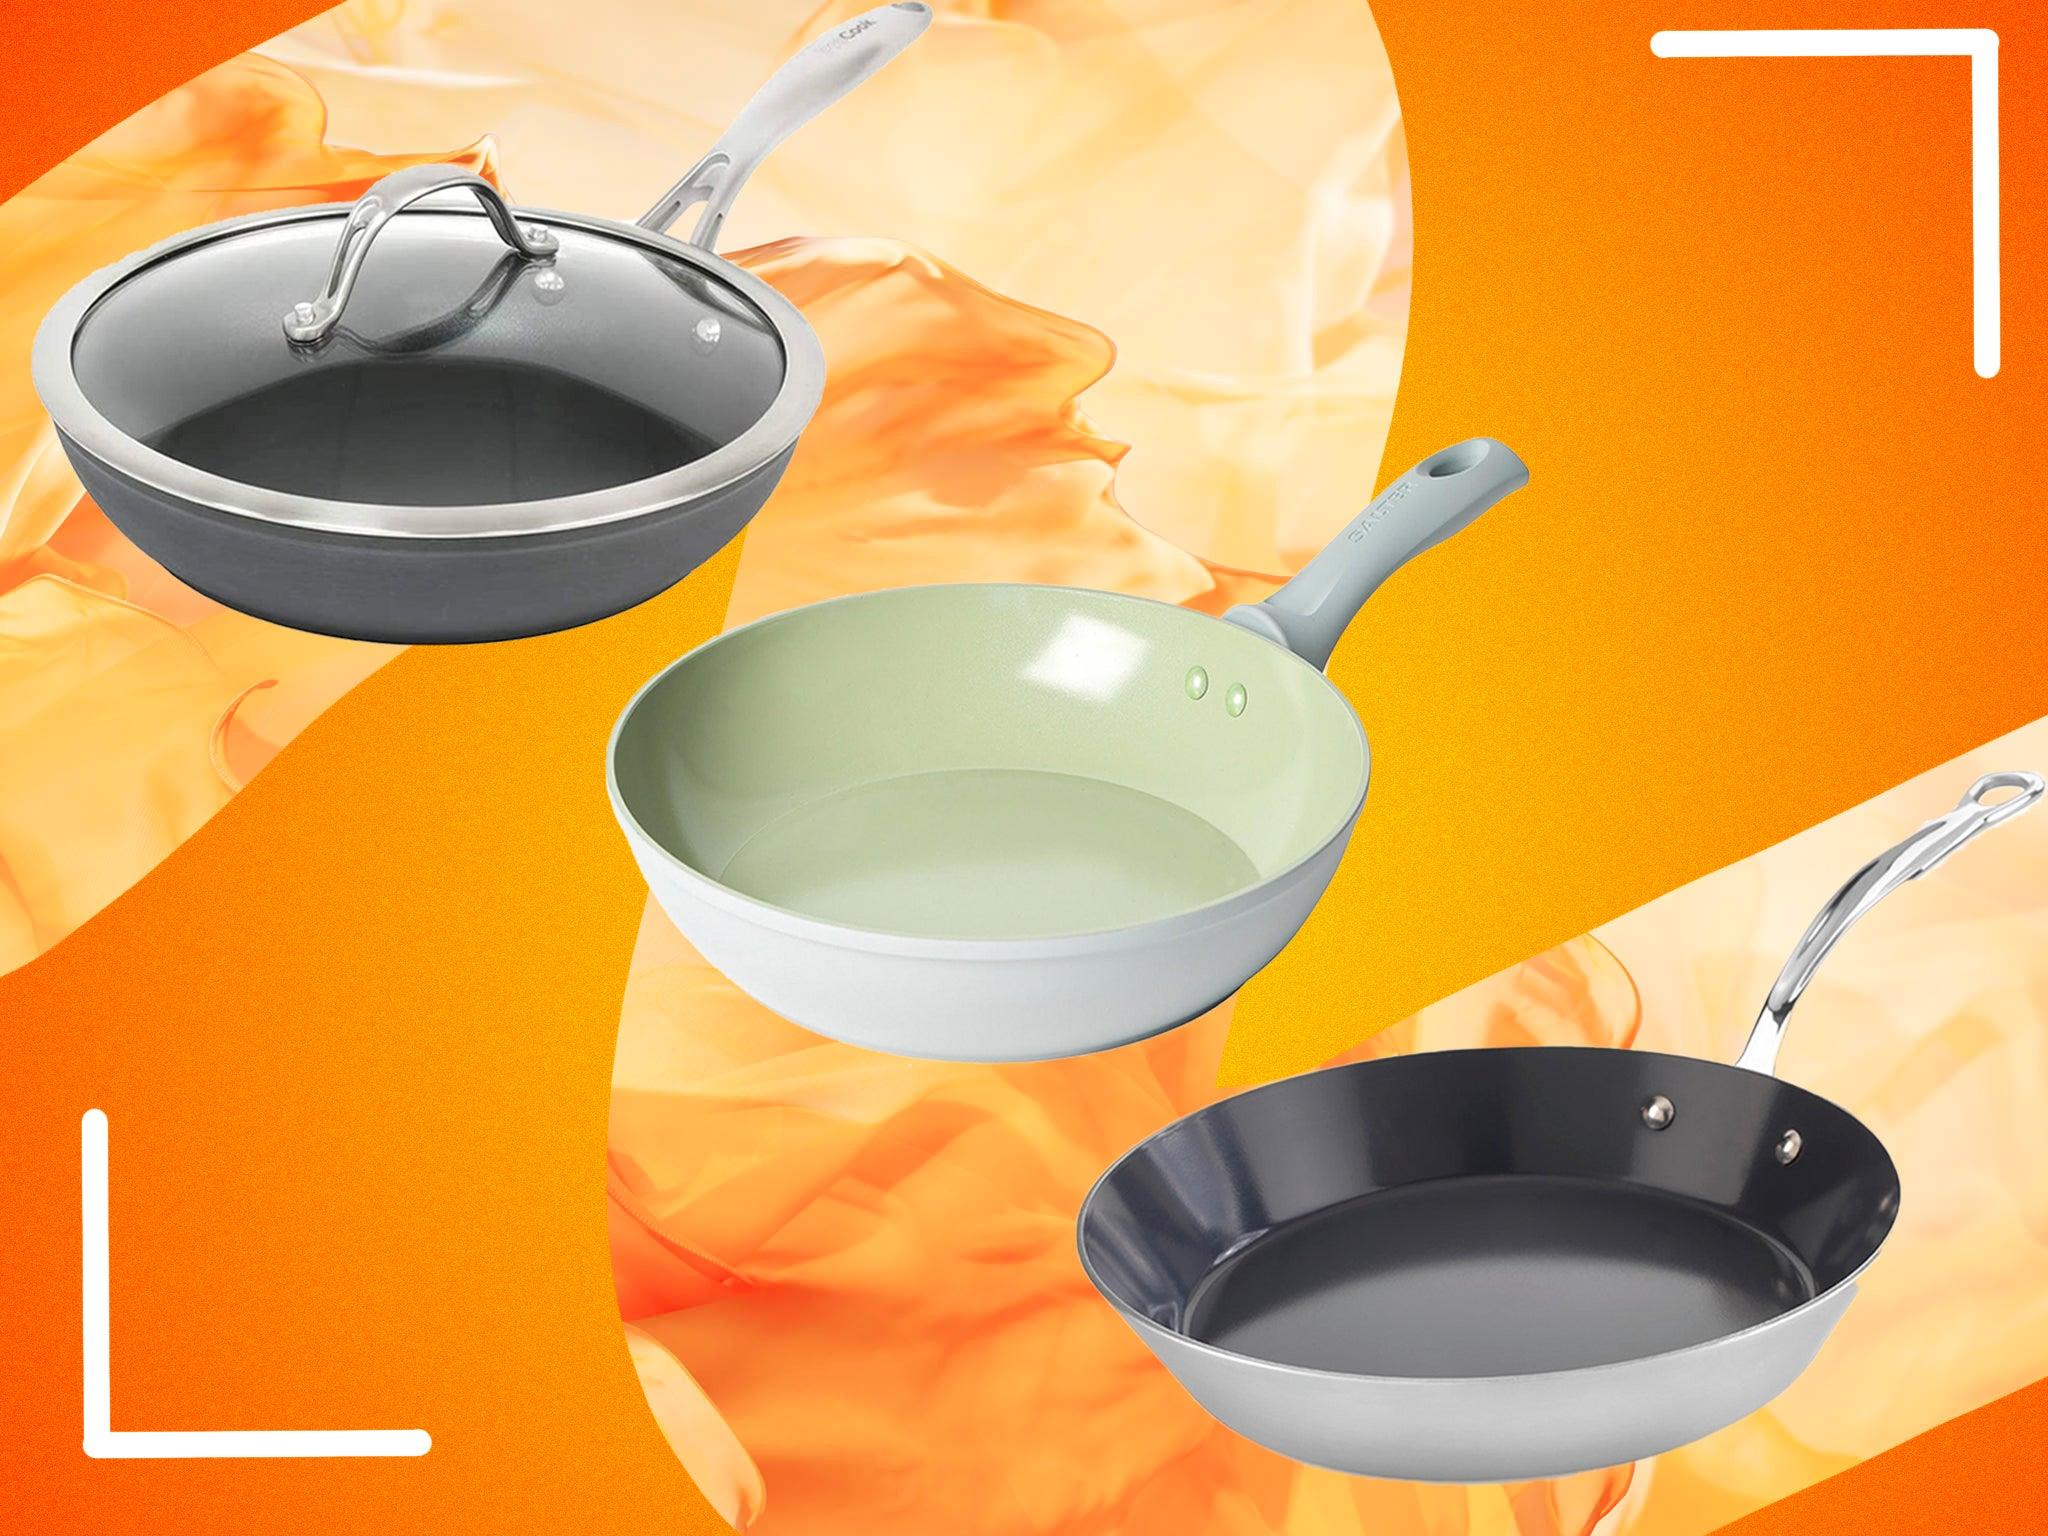 28cm Deep Saute Pan Lidded Non Stick Ceramic Coated Induction Pot Cooking Frying